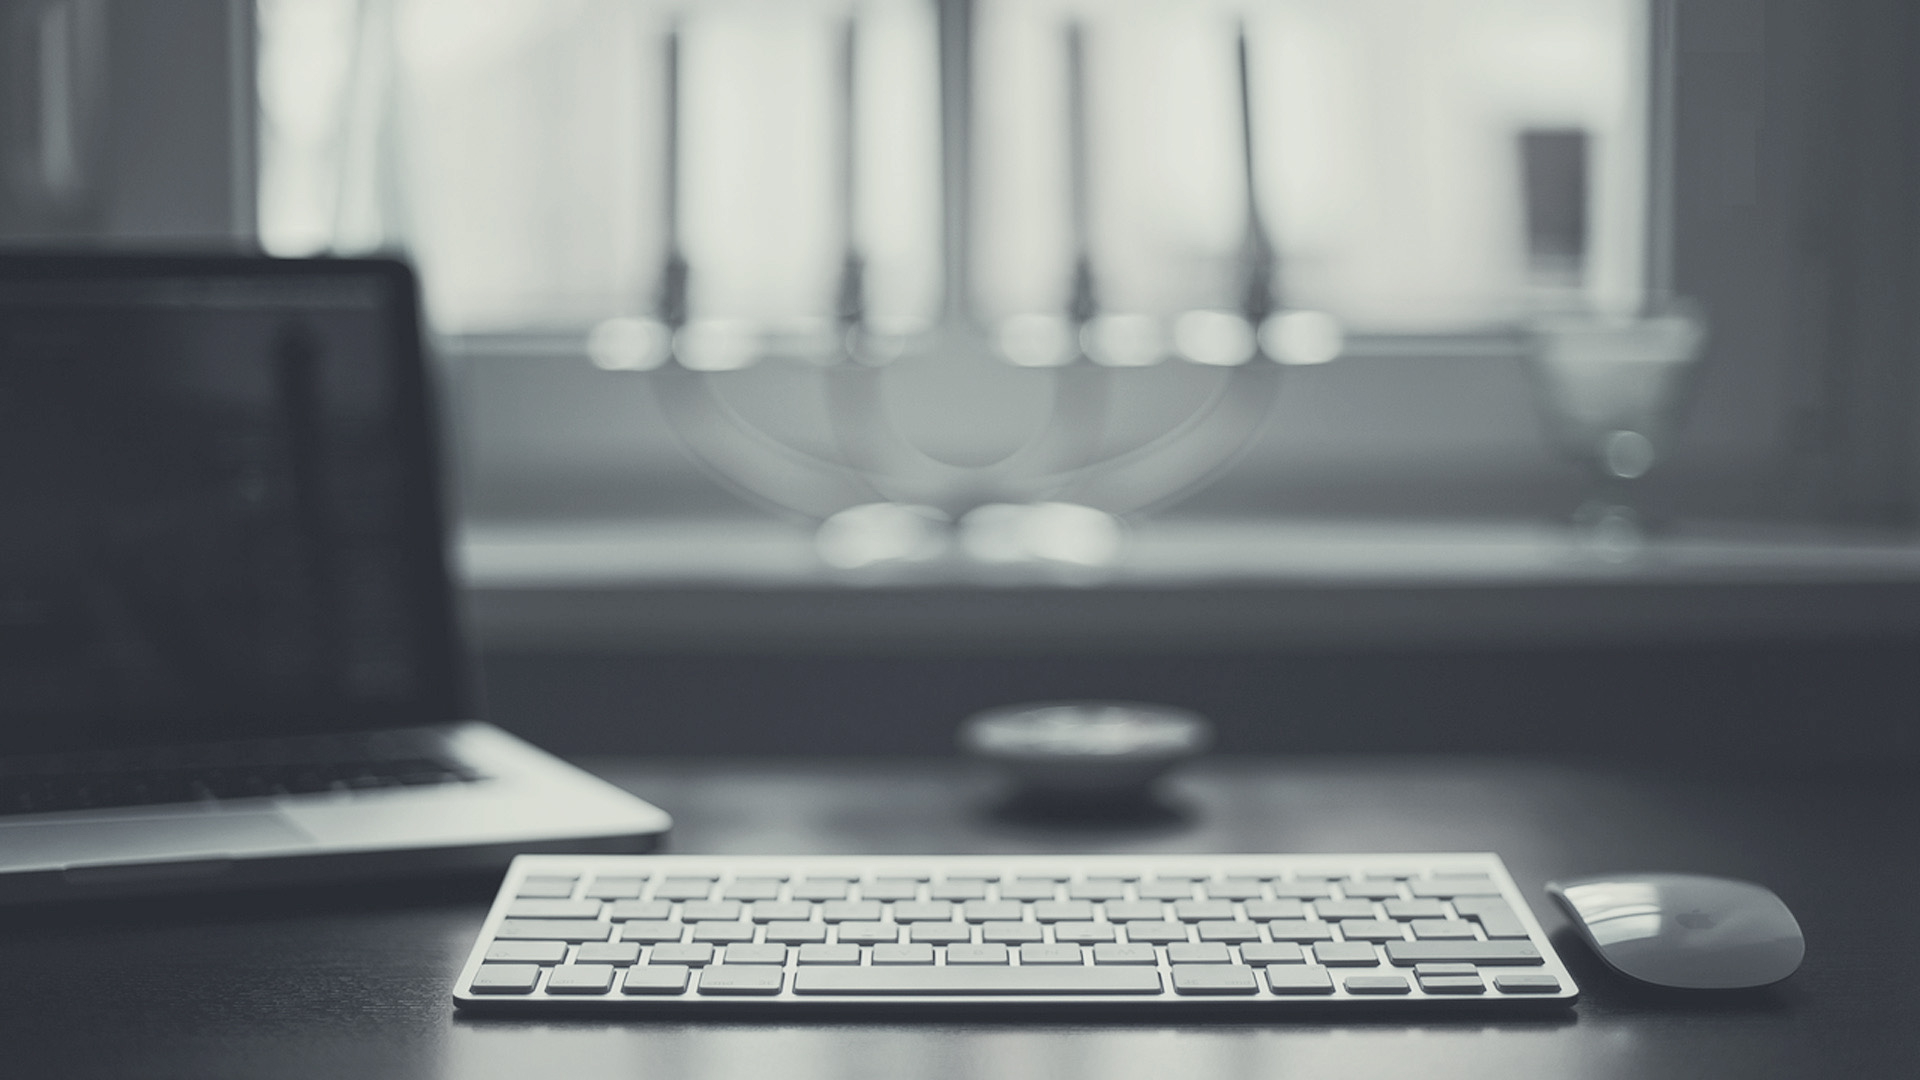 Mac Keyboard Complete Shortcuts List